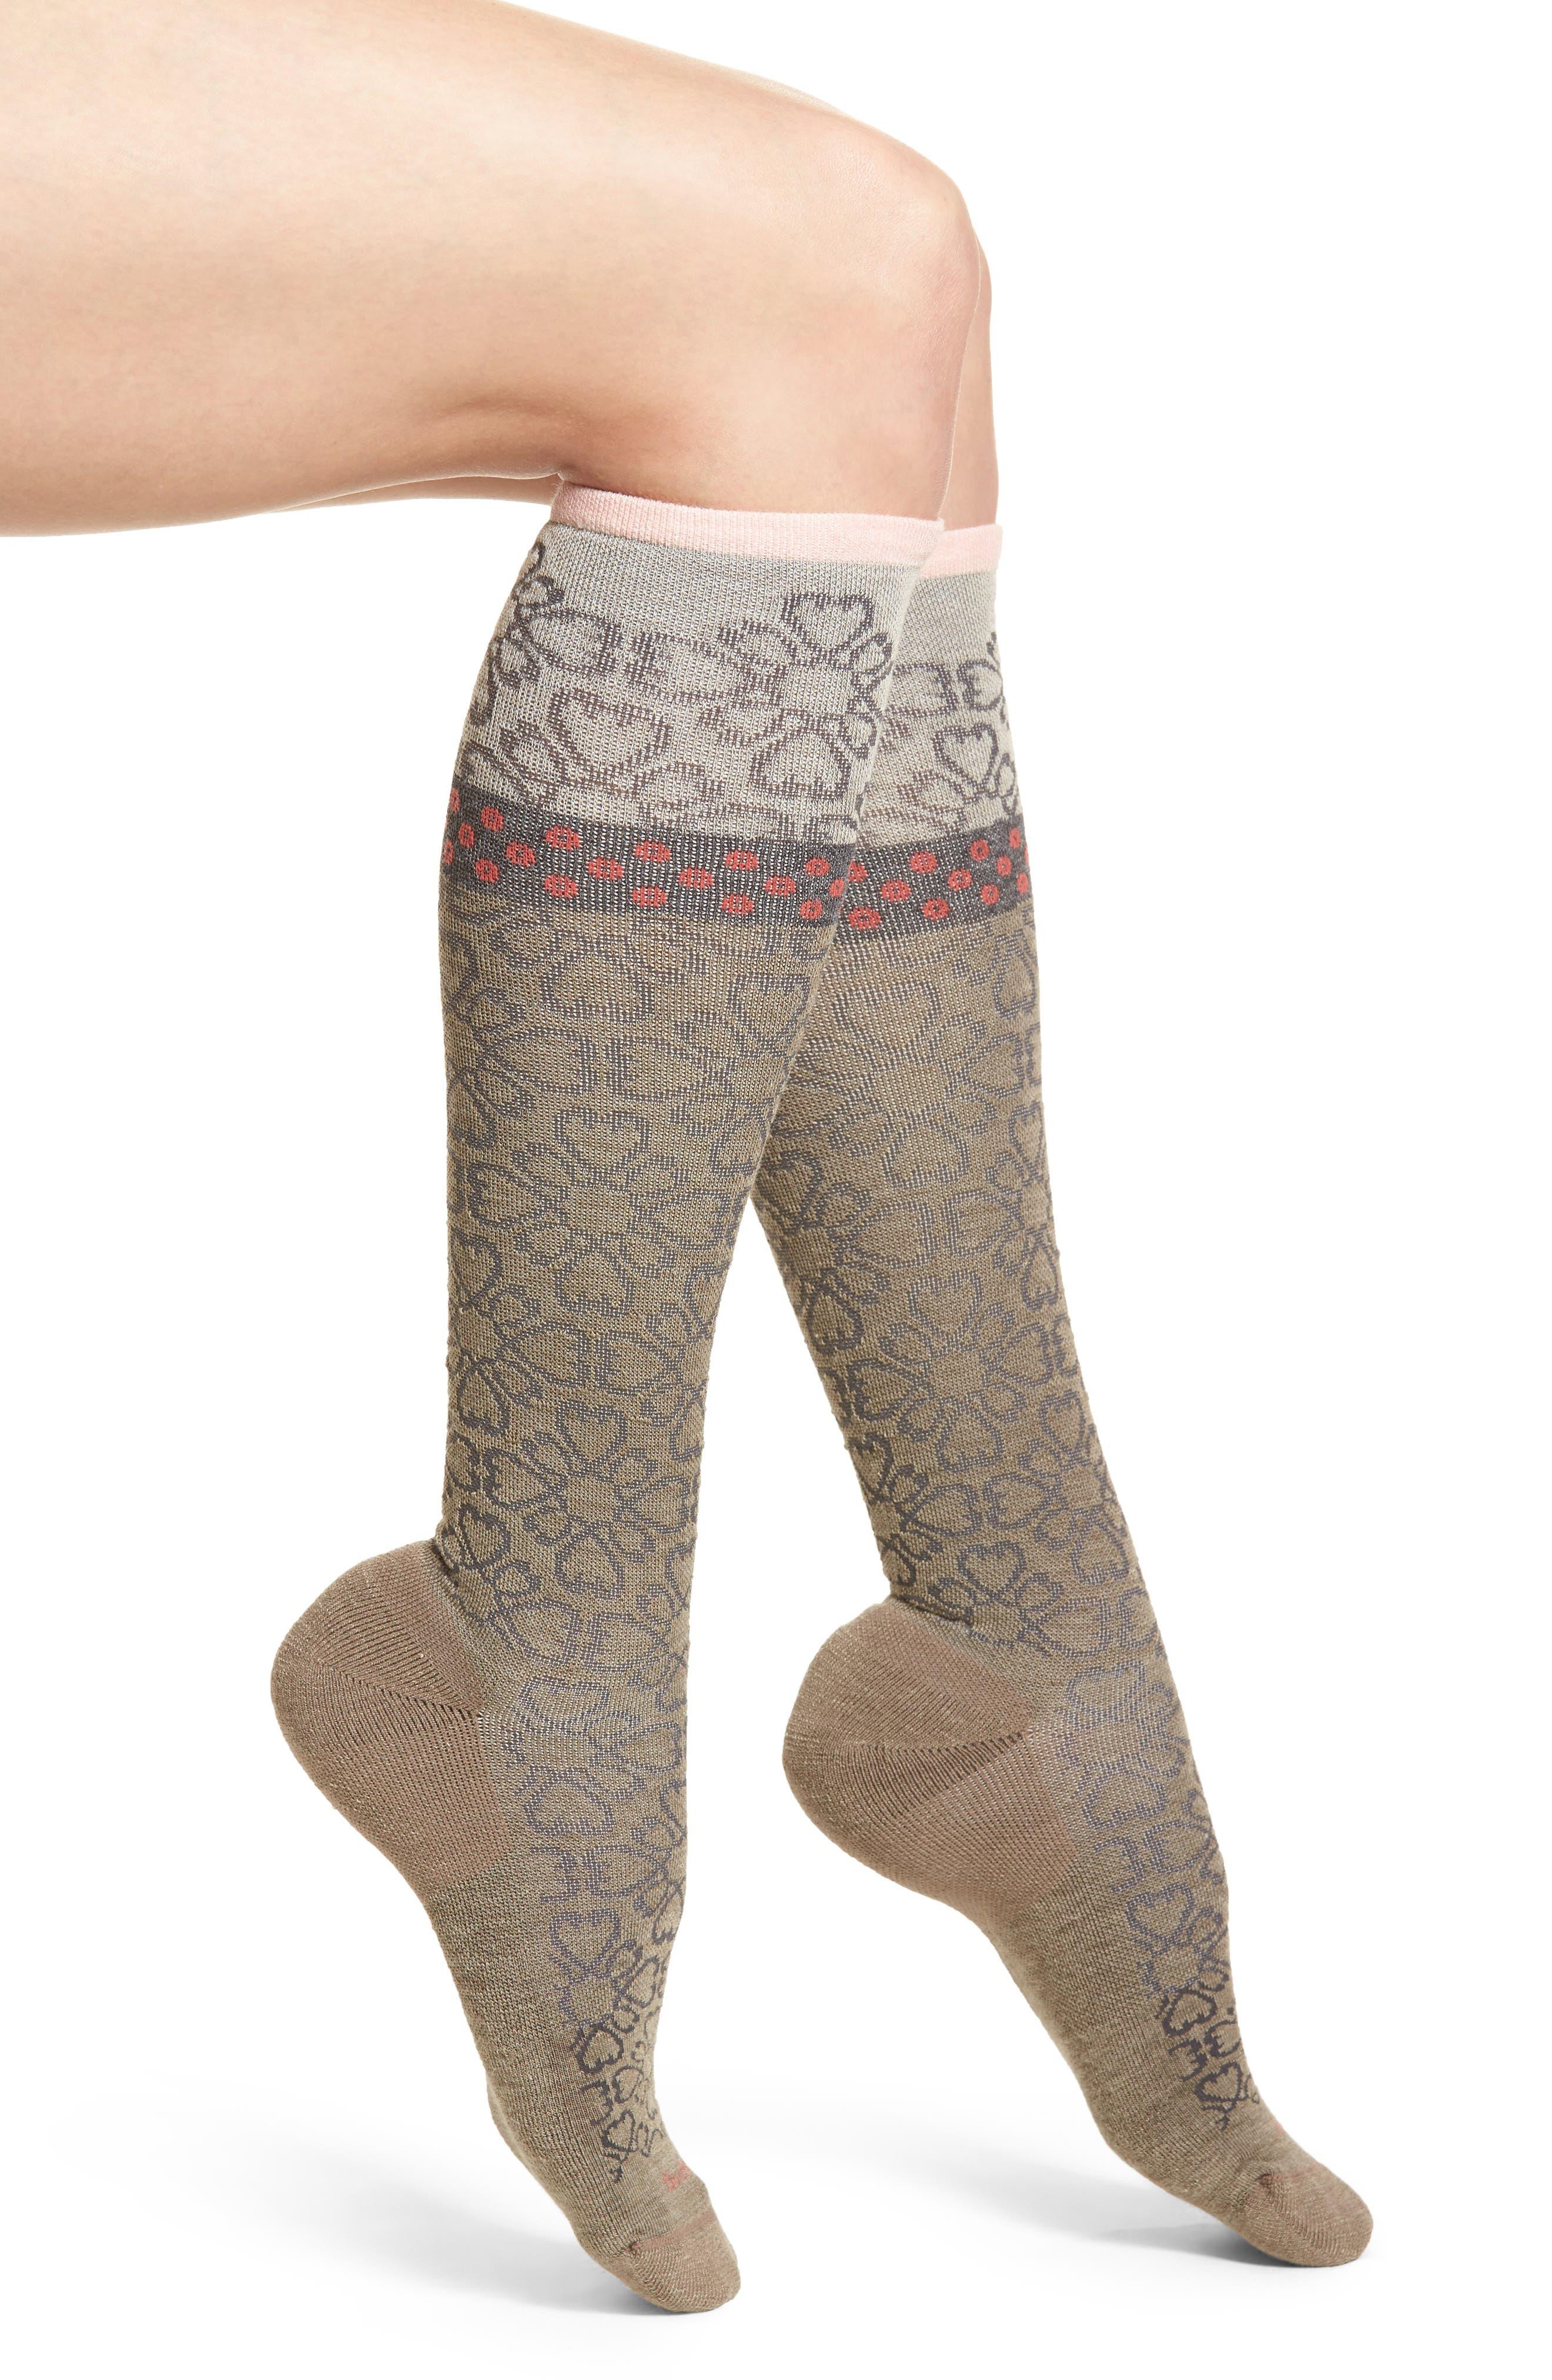 Sockwell Botanical Compression Socks